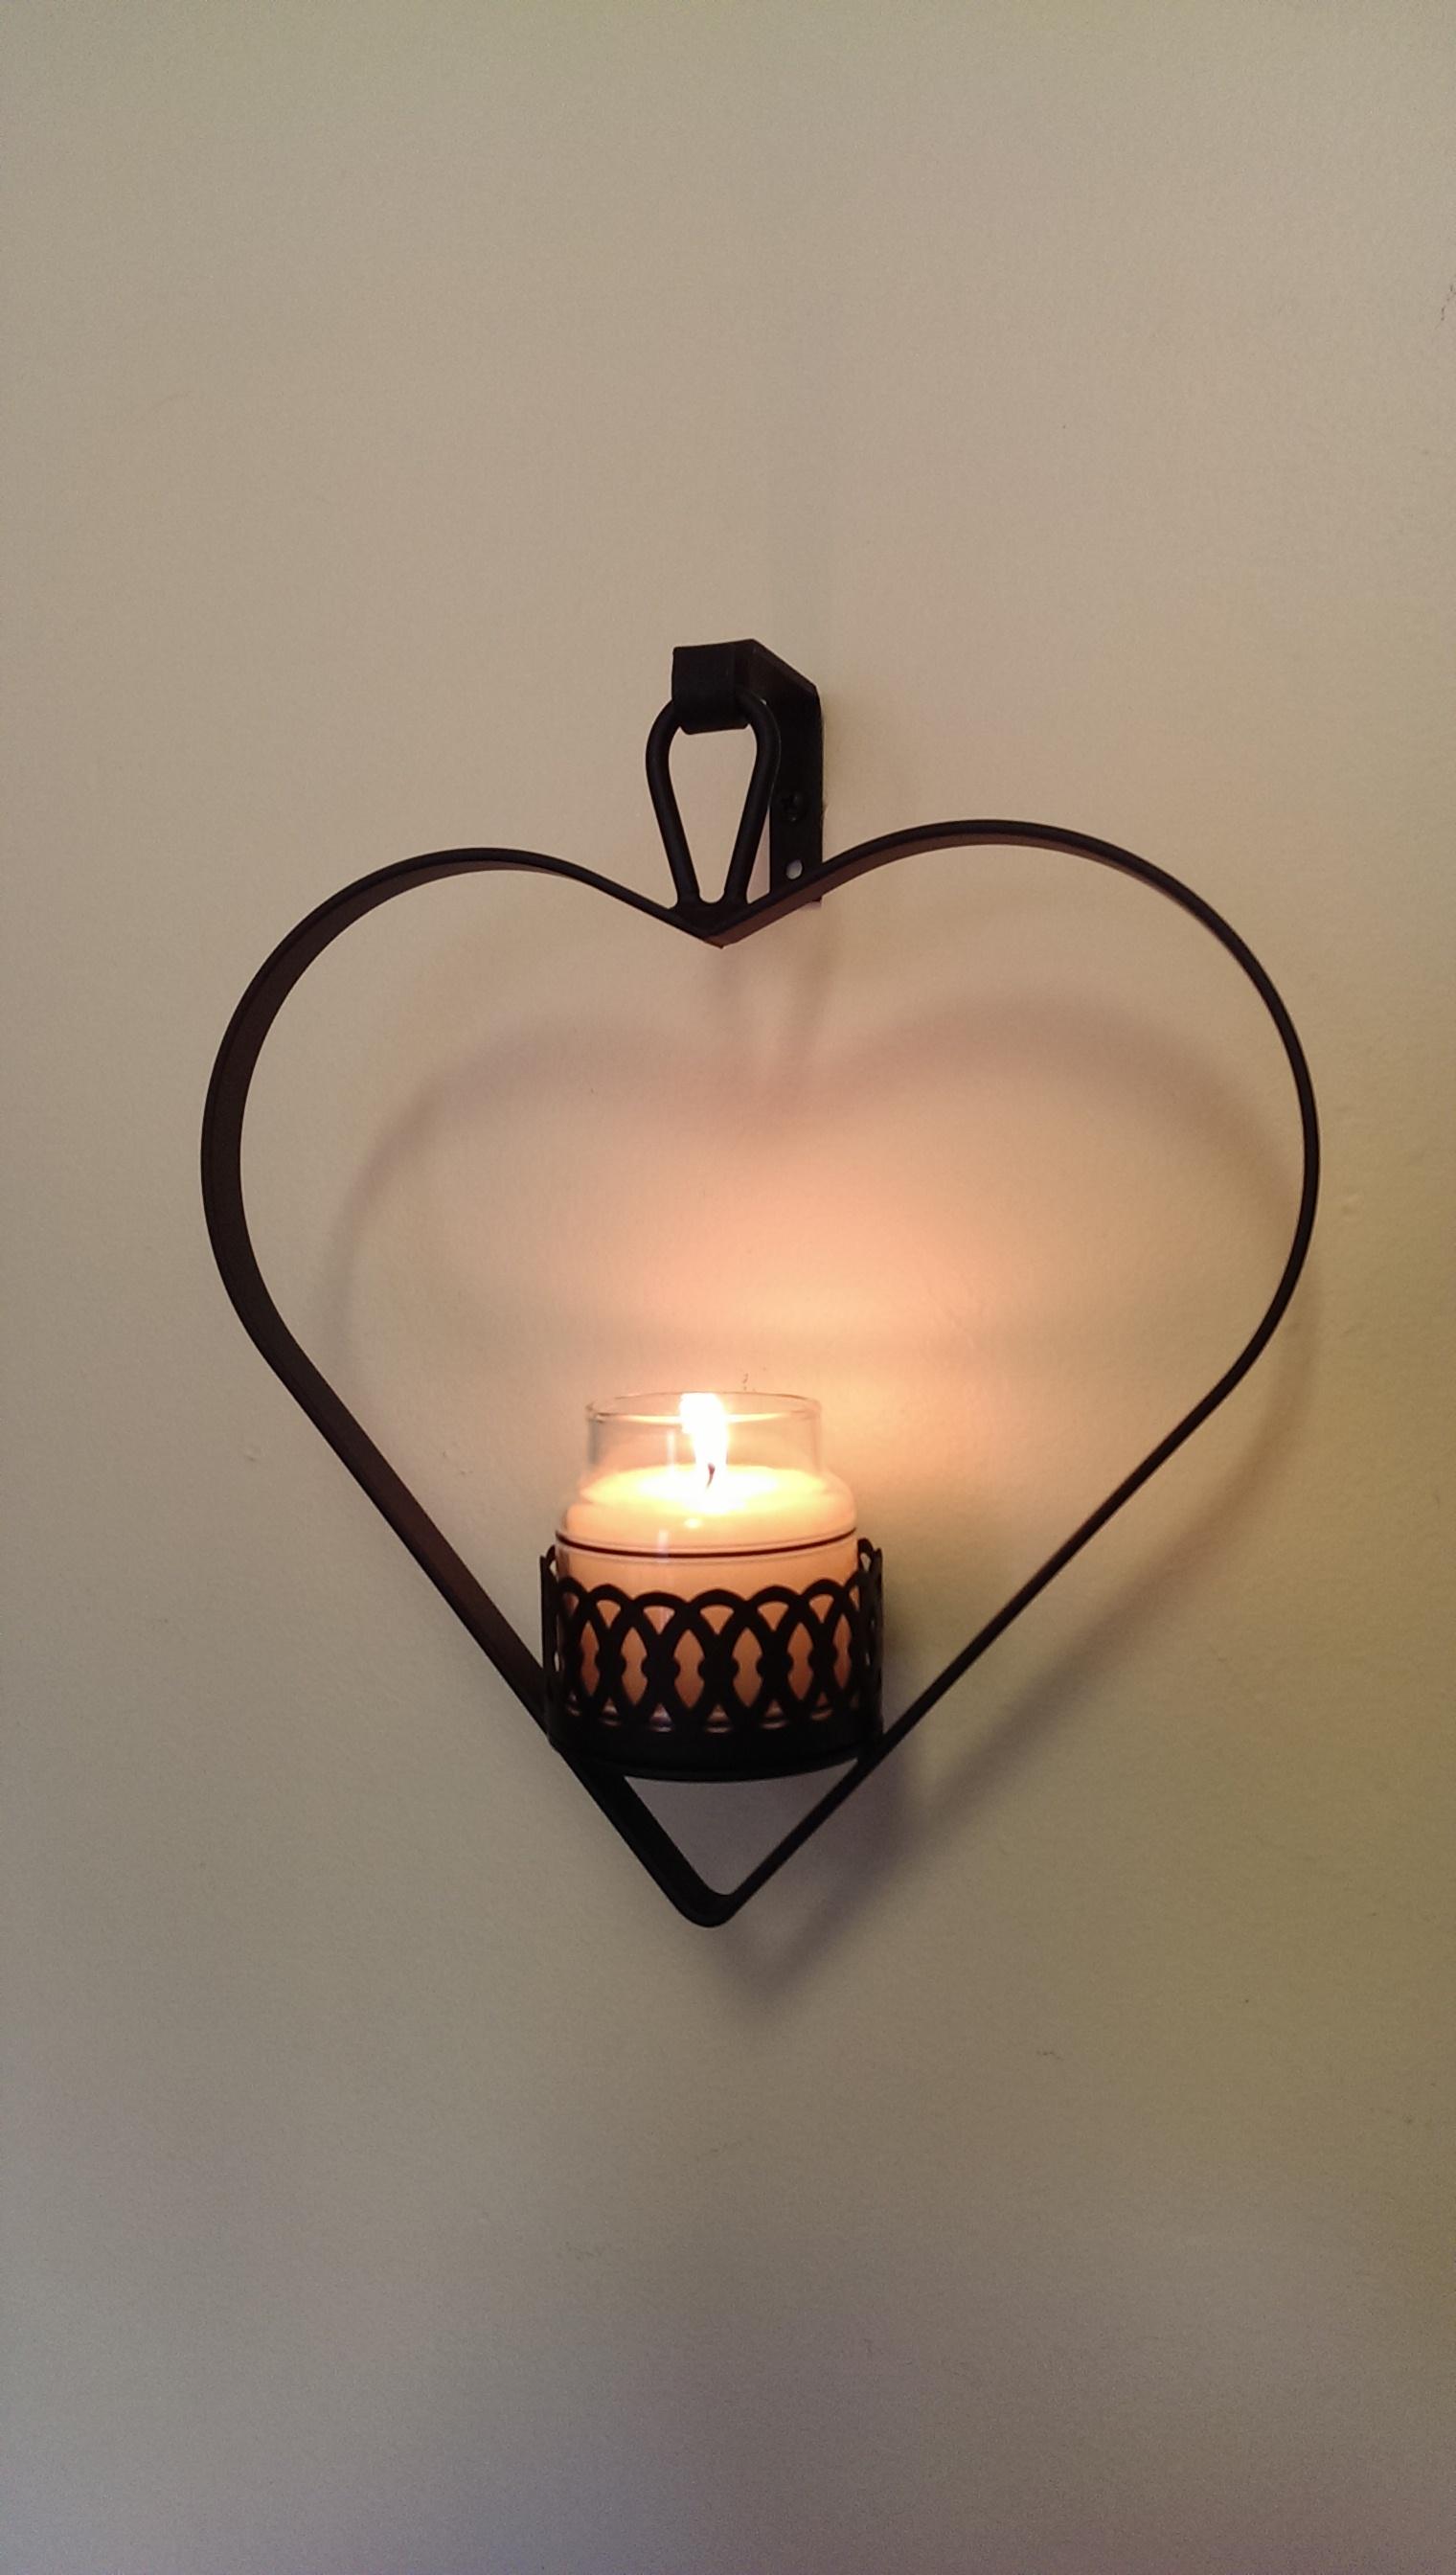 NO LONGER AVAILABLE - Heart Mini Yankee Jar Holder -CLOSEOUT SALE